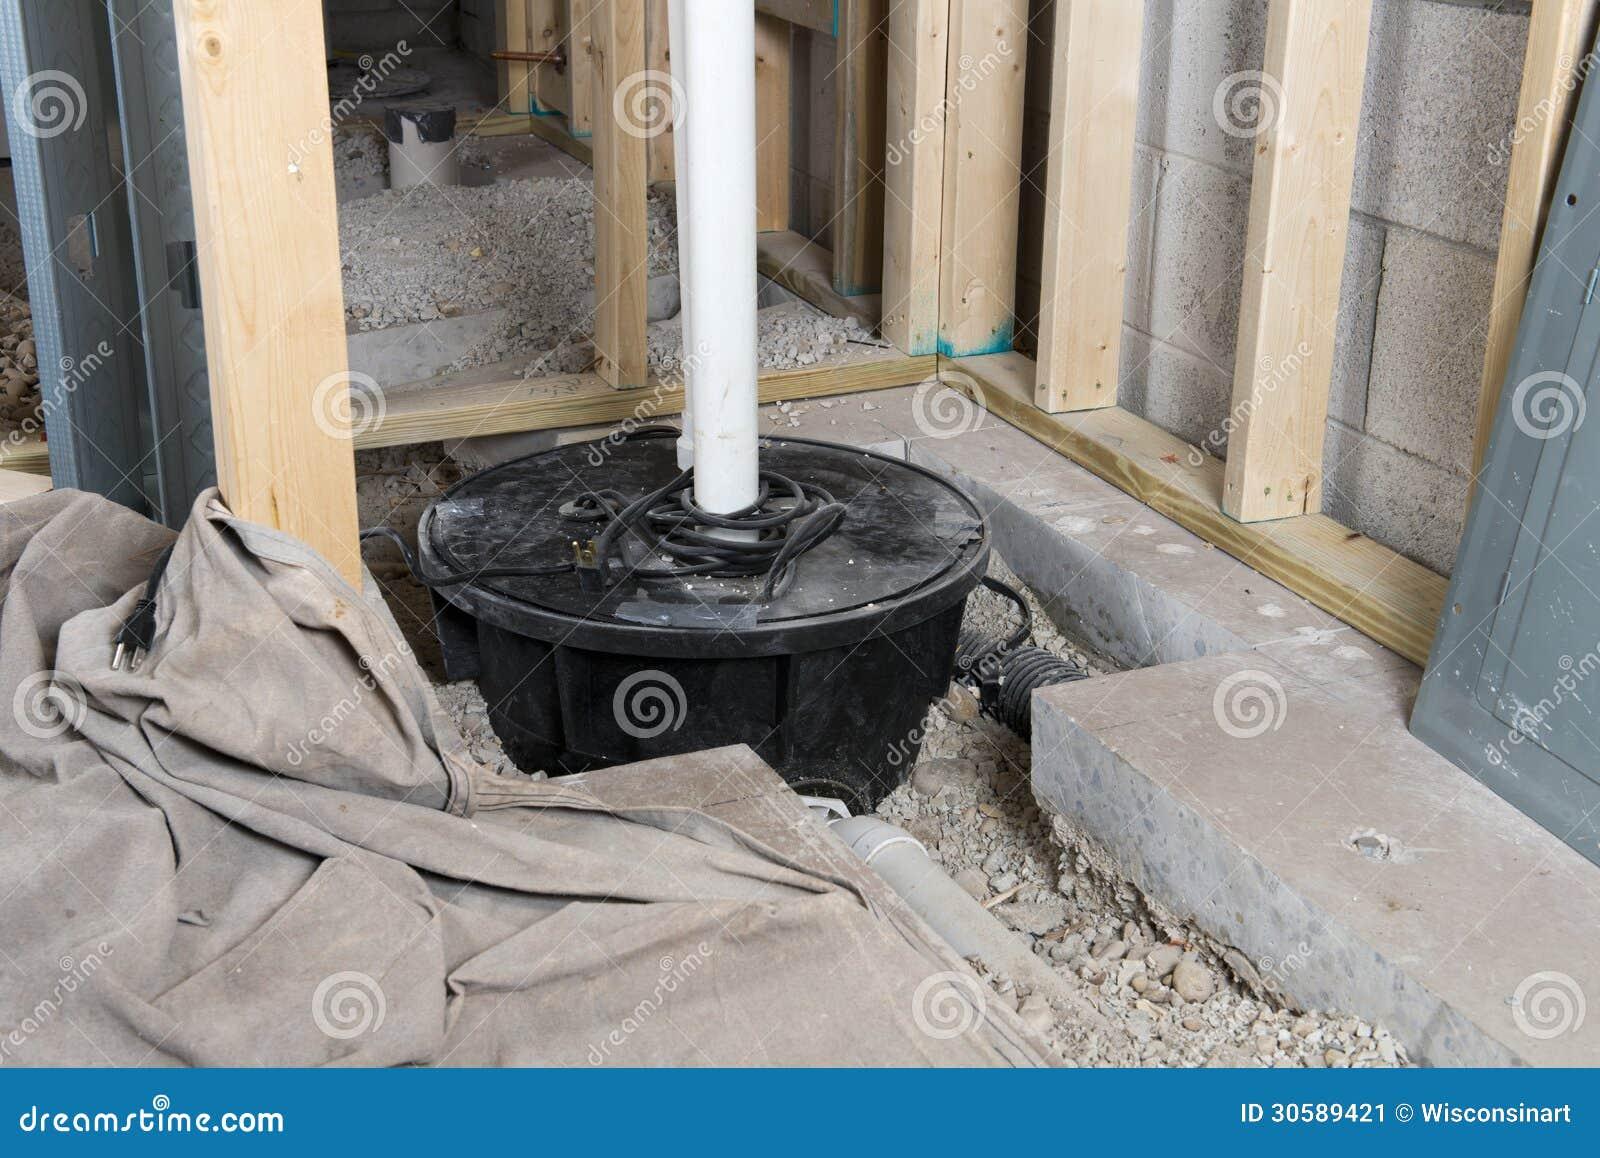 Basement Sump Pump Crock Home Improvement Stock Image